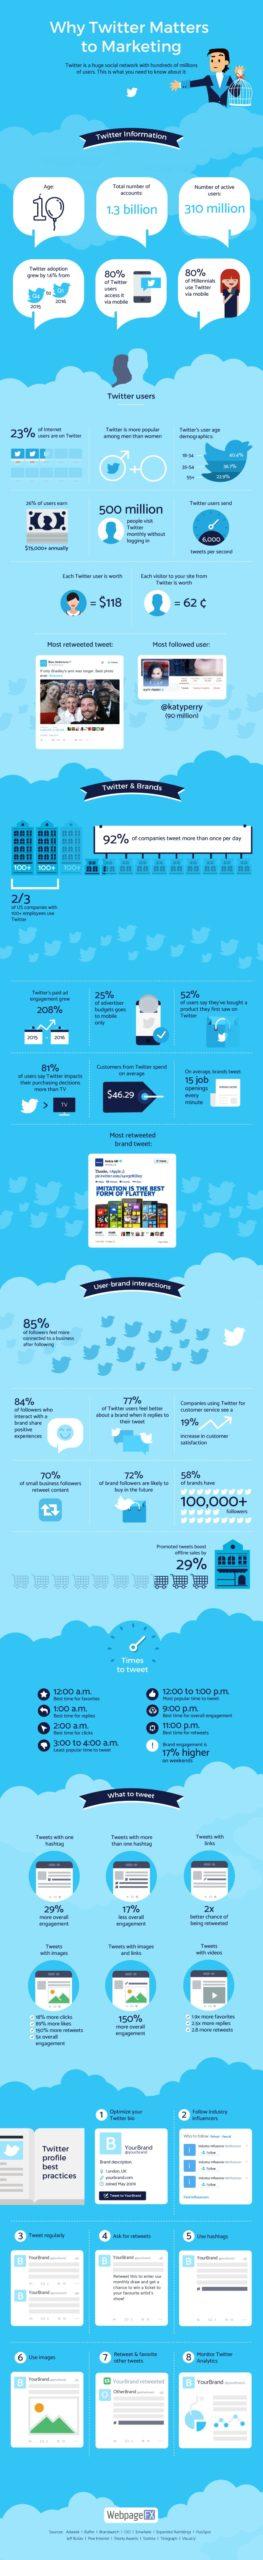 twitter digital marketing